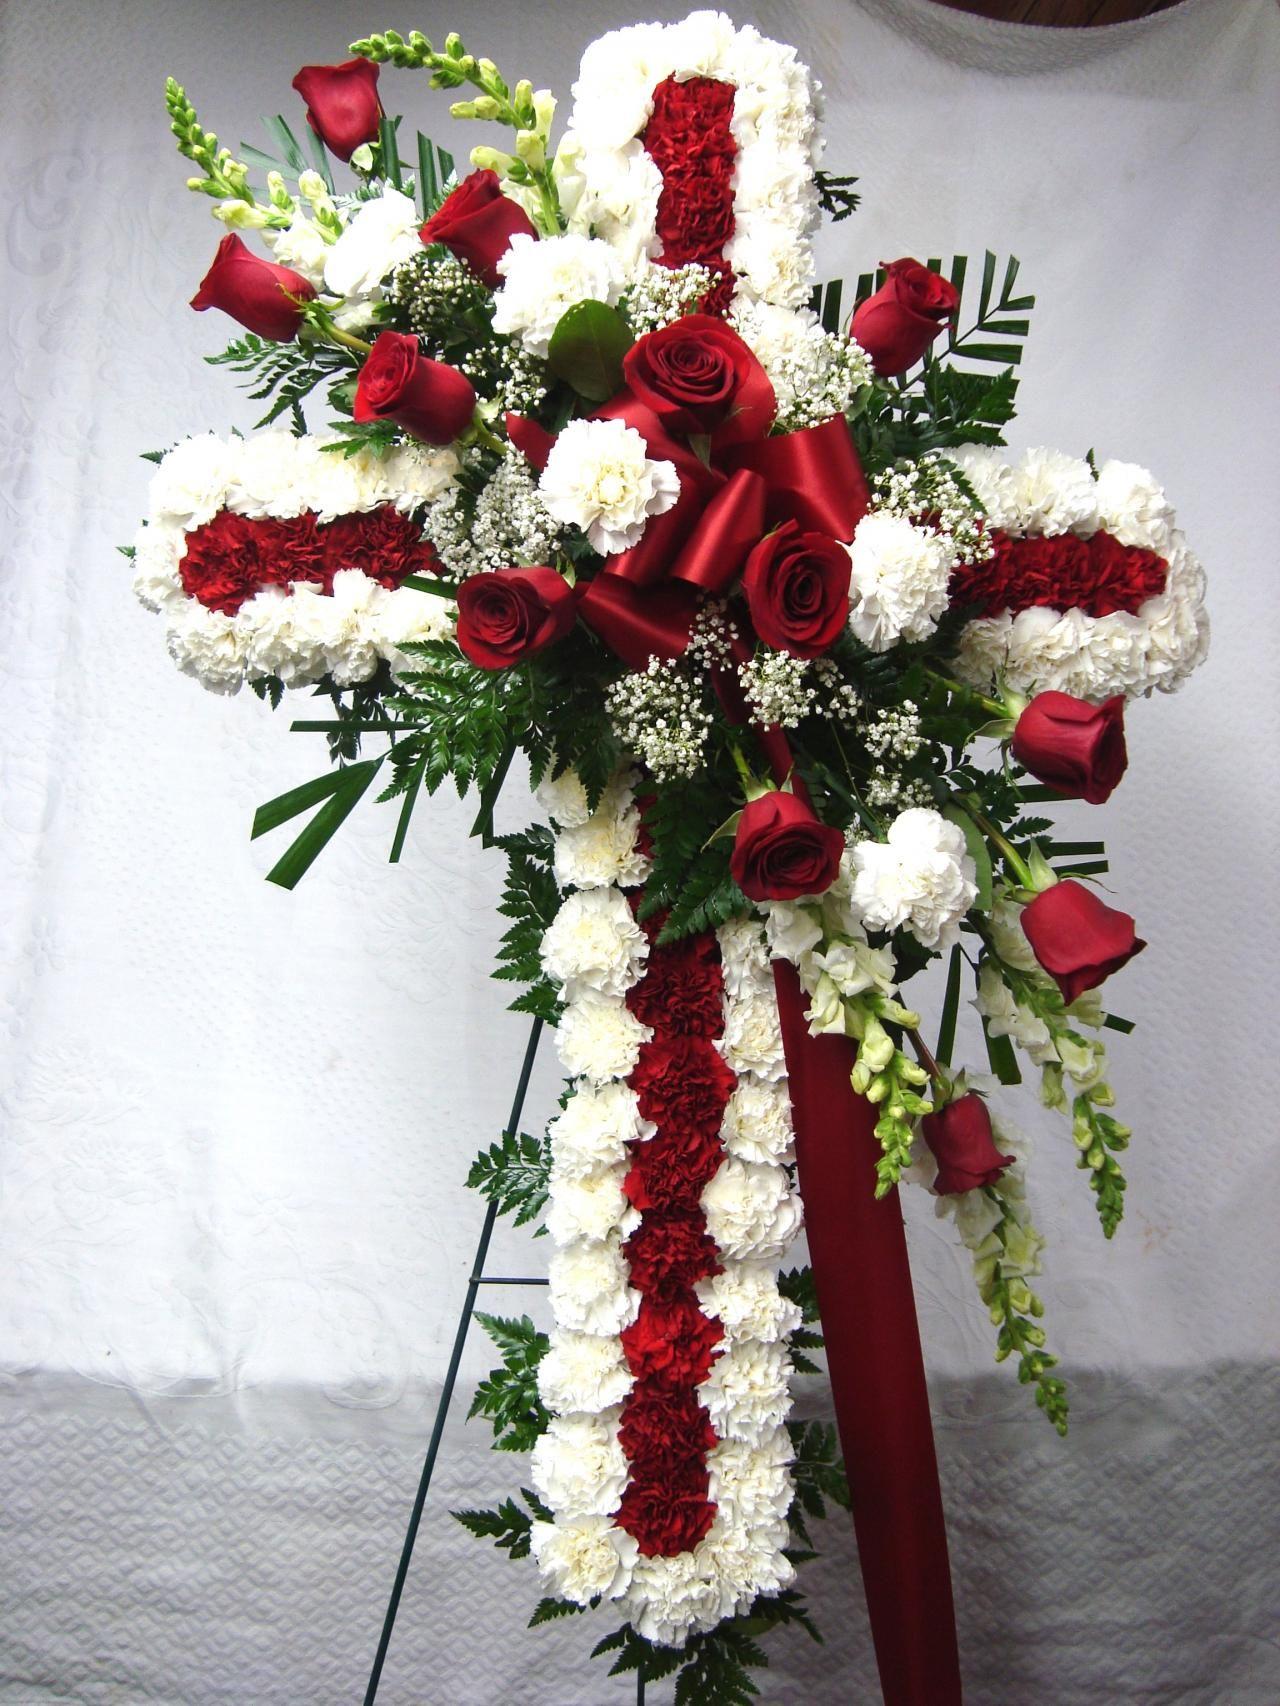 6cross84163416largeg 12801706 floral swags pinterest funeral flower arrangements 6cross84163416largeg 12801706 izmirmasajfo Image collections